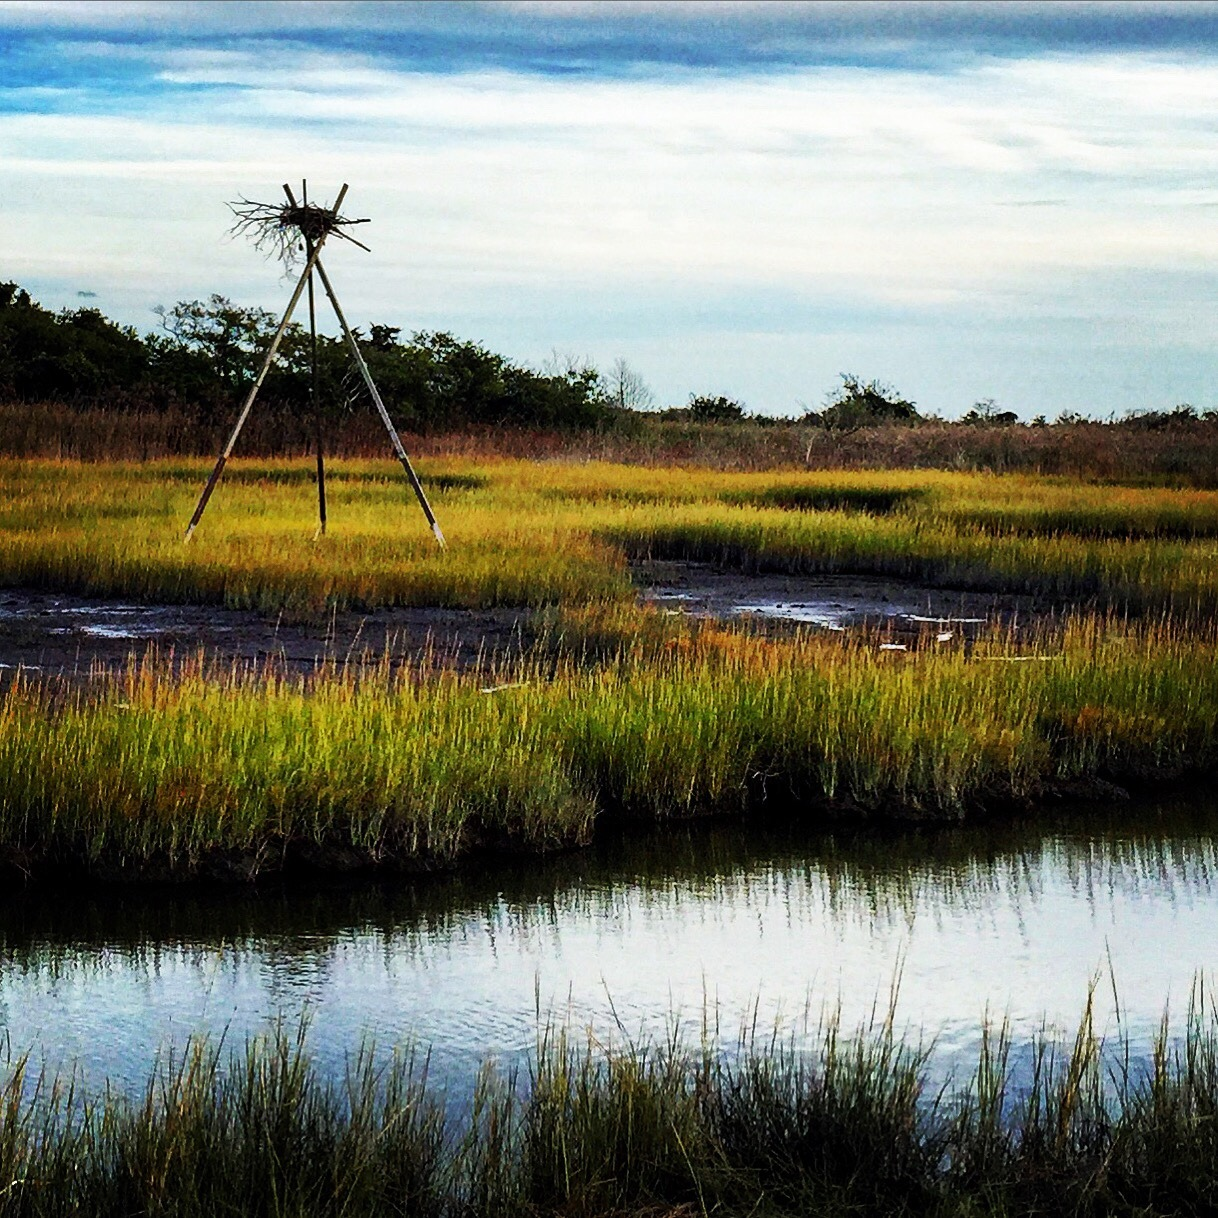 A heron's nest tucked into Gooseneck Creek marsh in Newport, Rhode Island.  #newport #rhodeisland #newportwineandfoodfestival